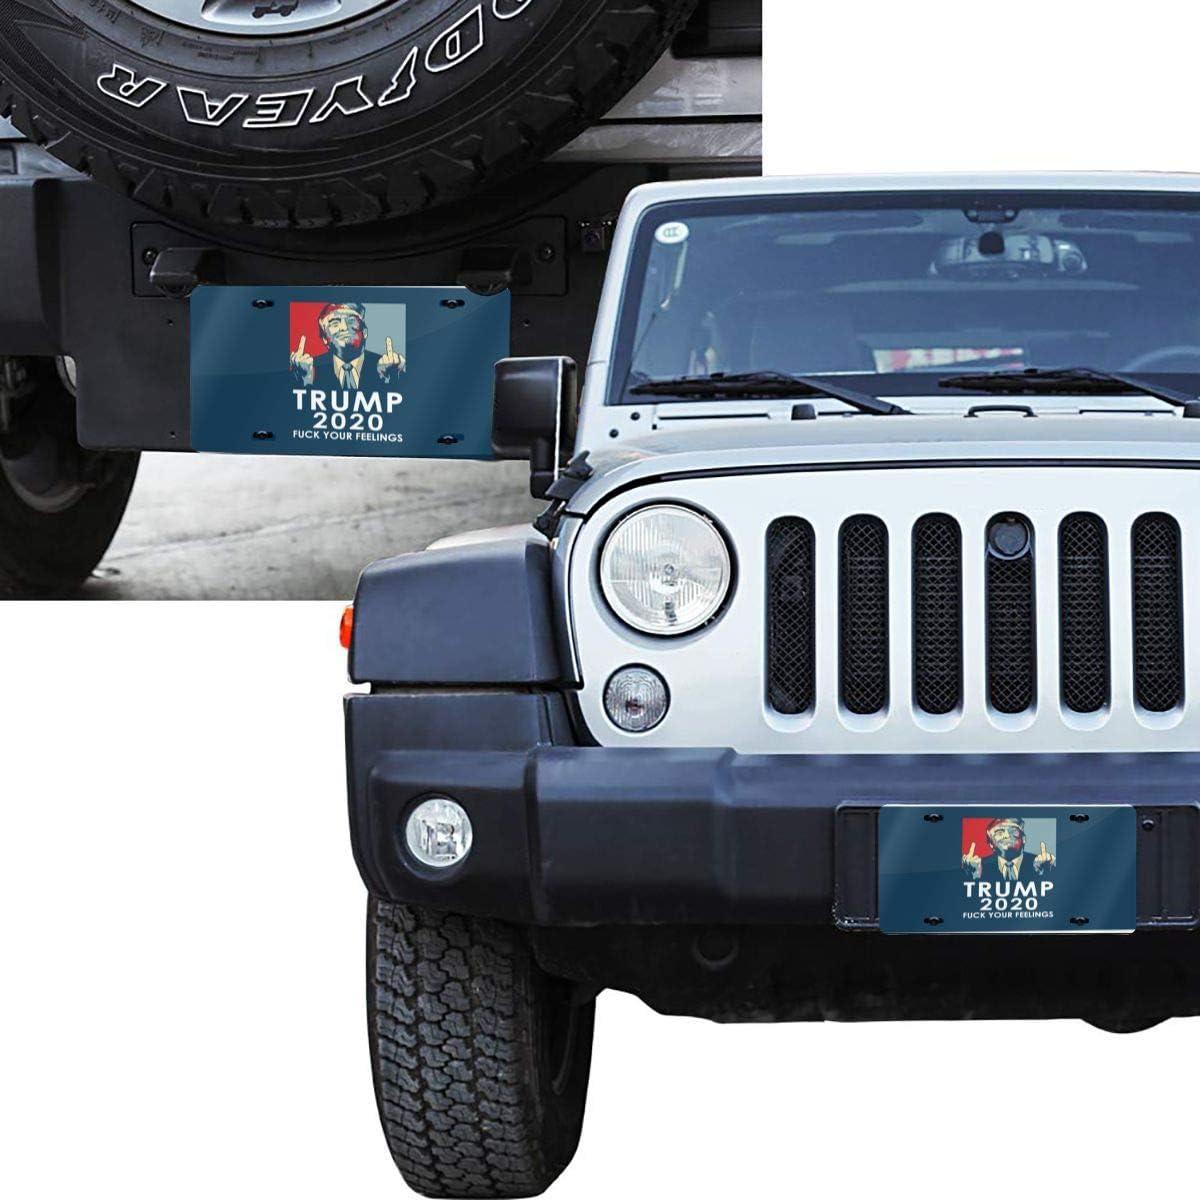 Jpnvxie Trump License Plate Covers Vanity Tag Metal Car Plate Decorative Car Front Aluminum License Plate for Men Women Boy Girls Car 6x12 Inch